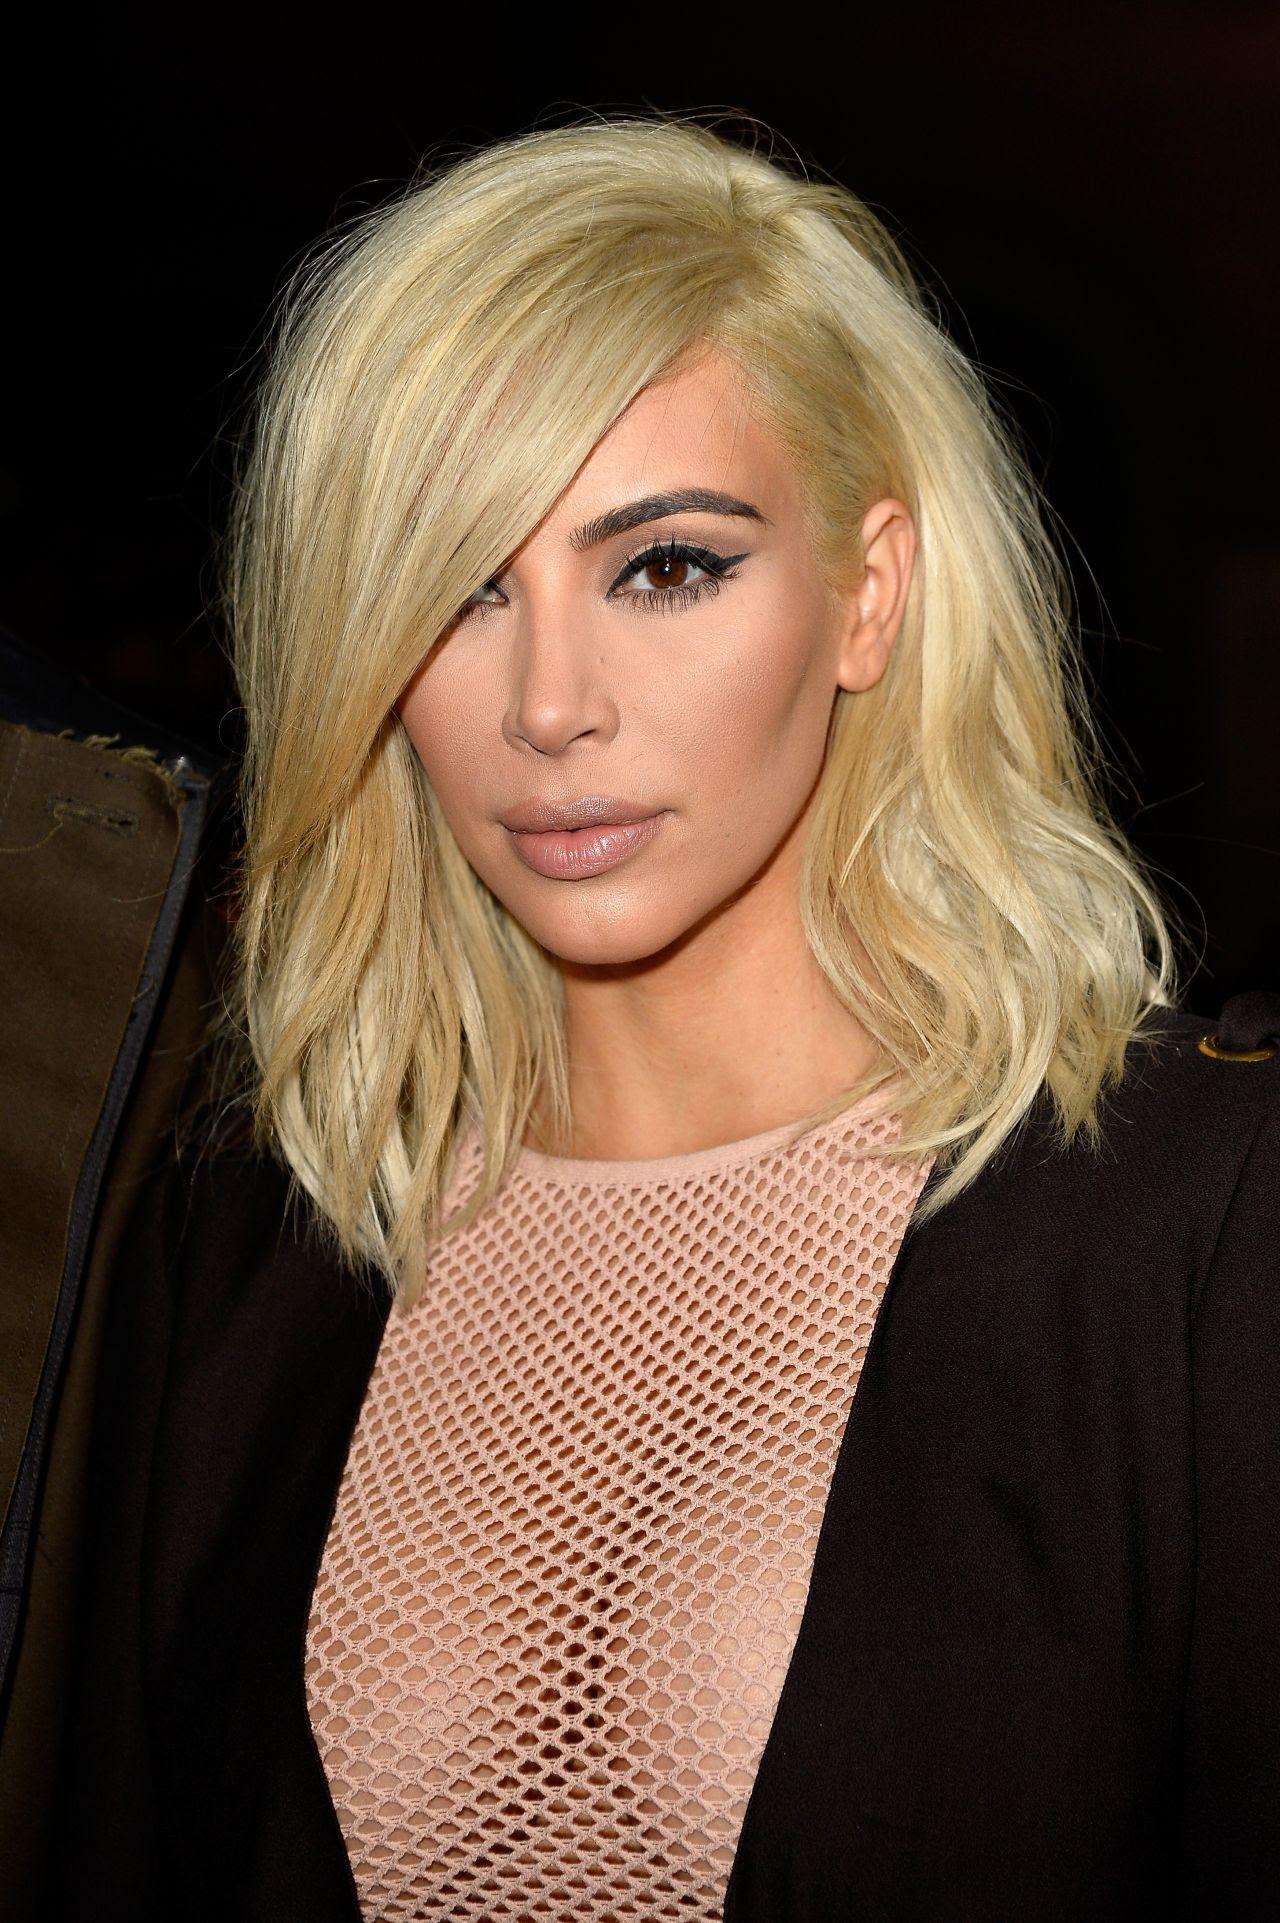 Kim Kardashian Is Blonde Now  Lanvin Fashion Show in Paris, March 2015